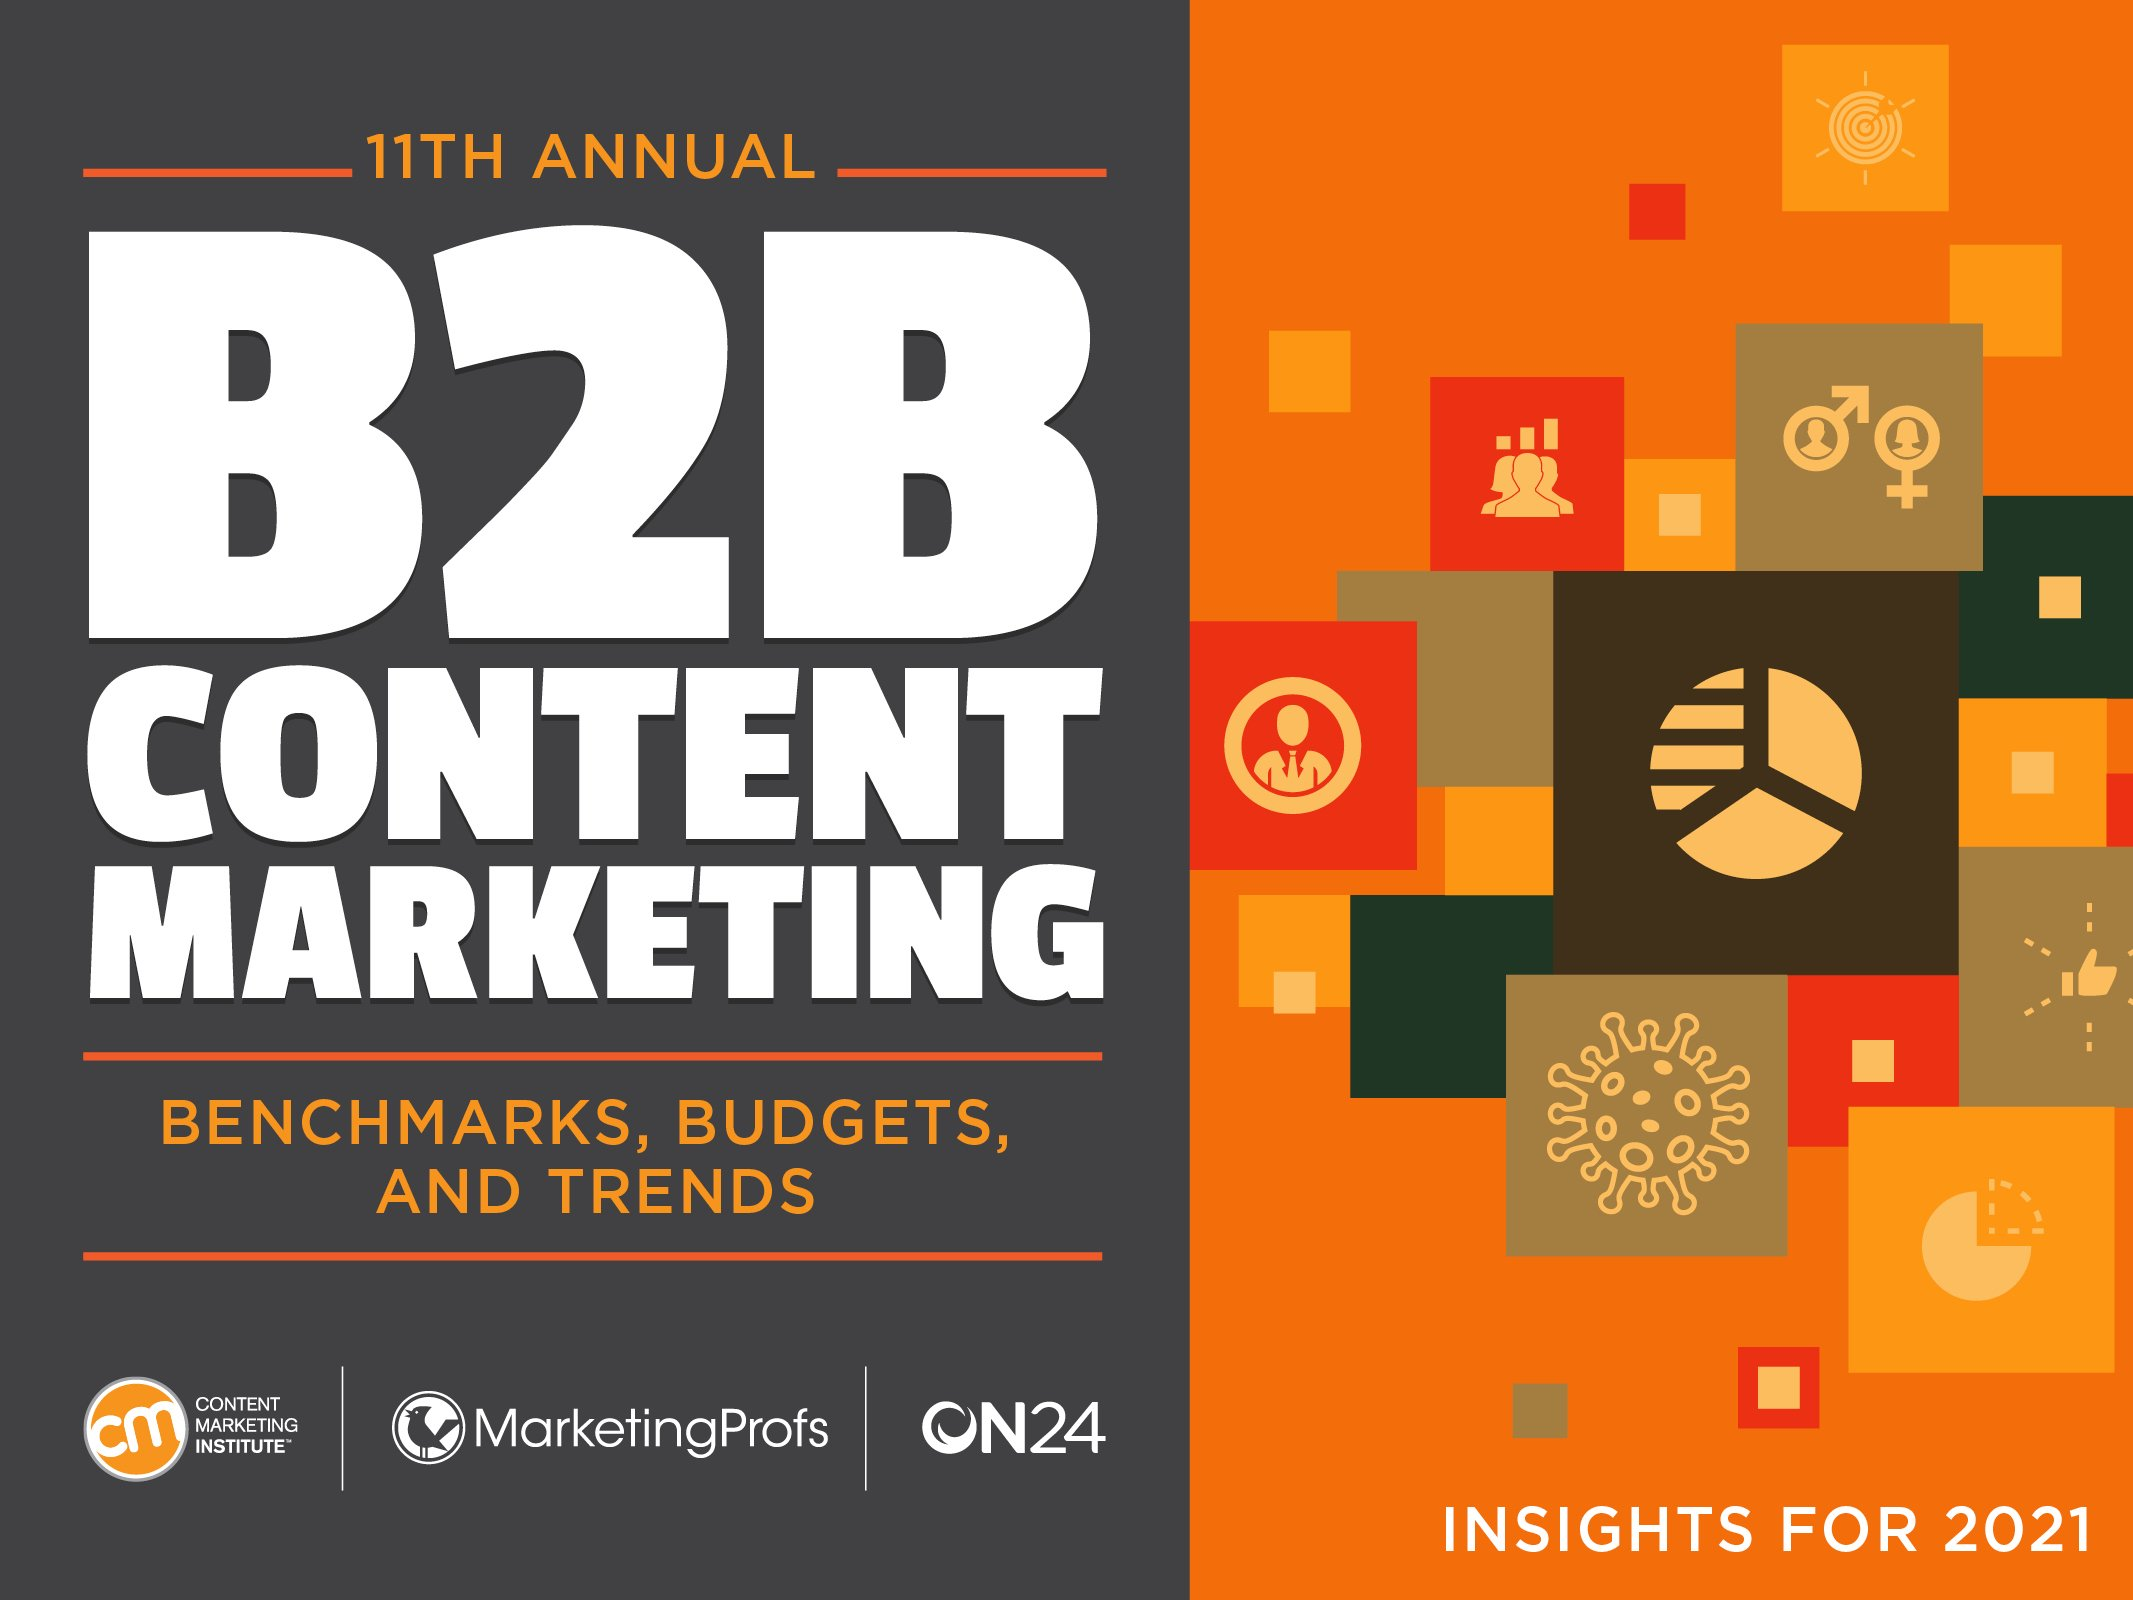 Content Management Trends Image